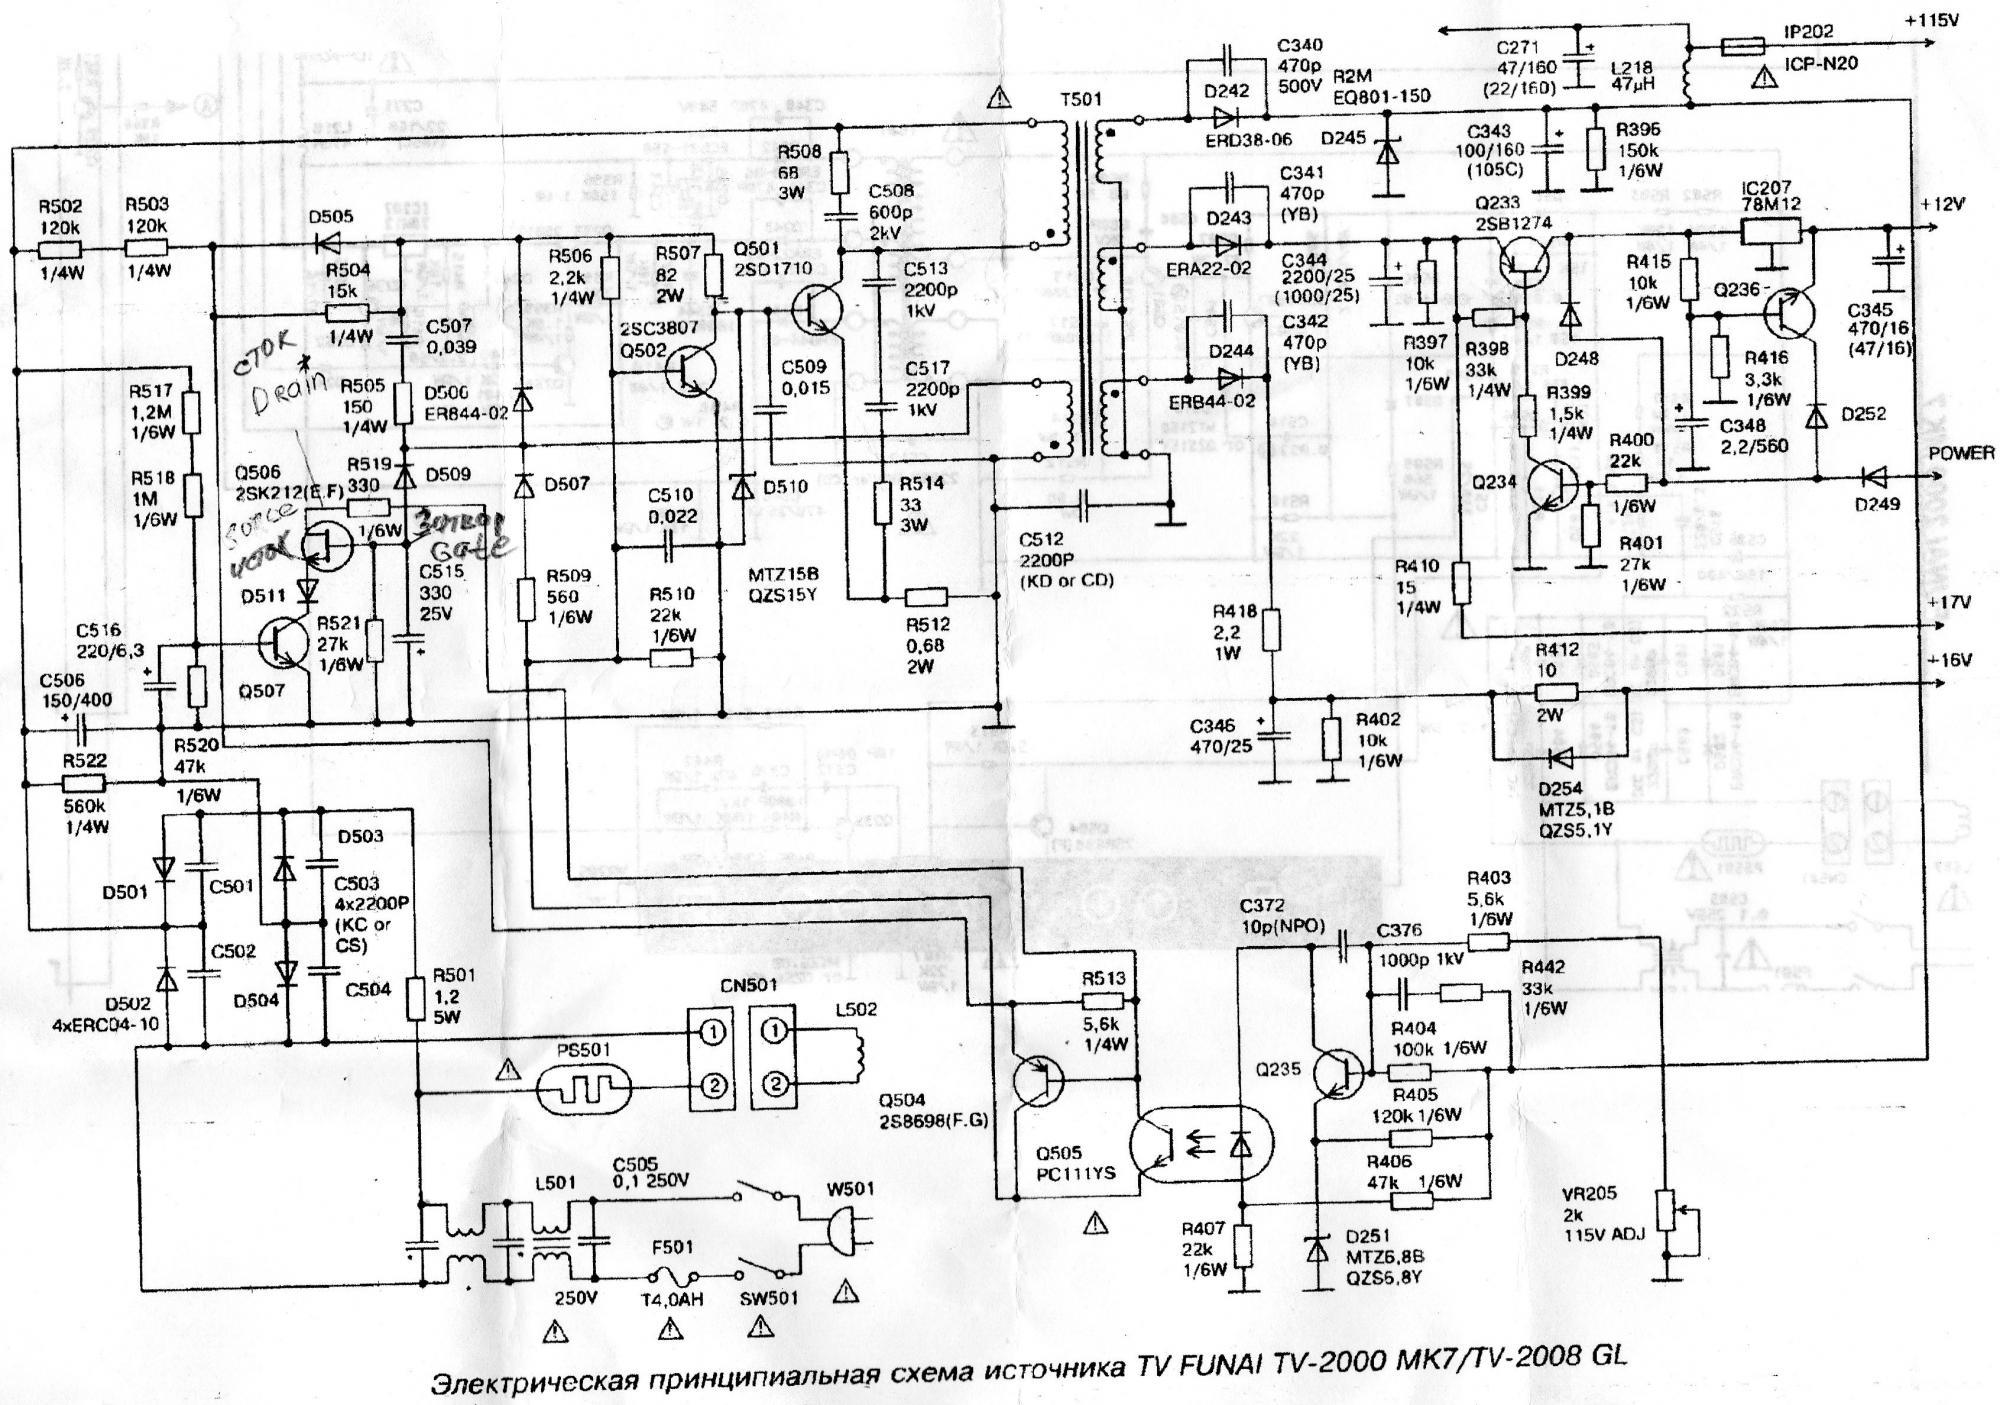 Фунай 2000 мк10 схема